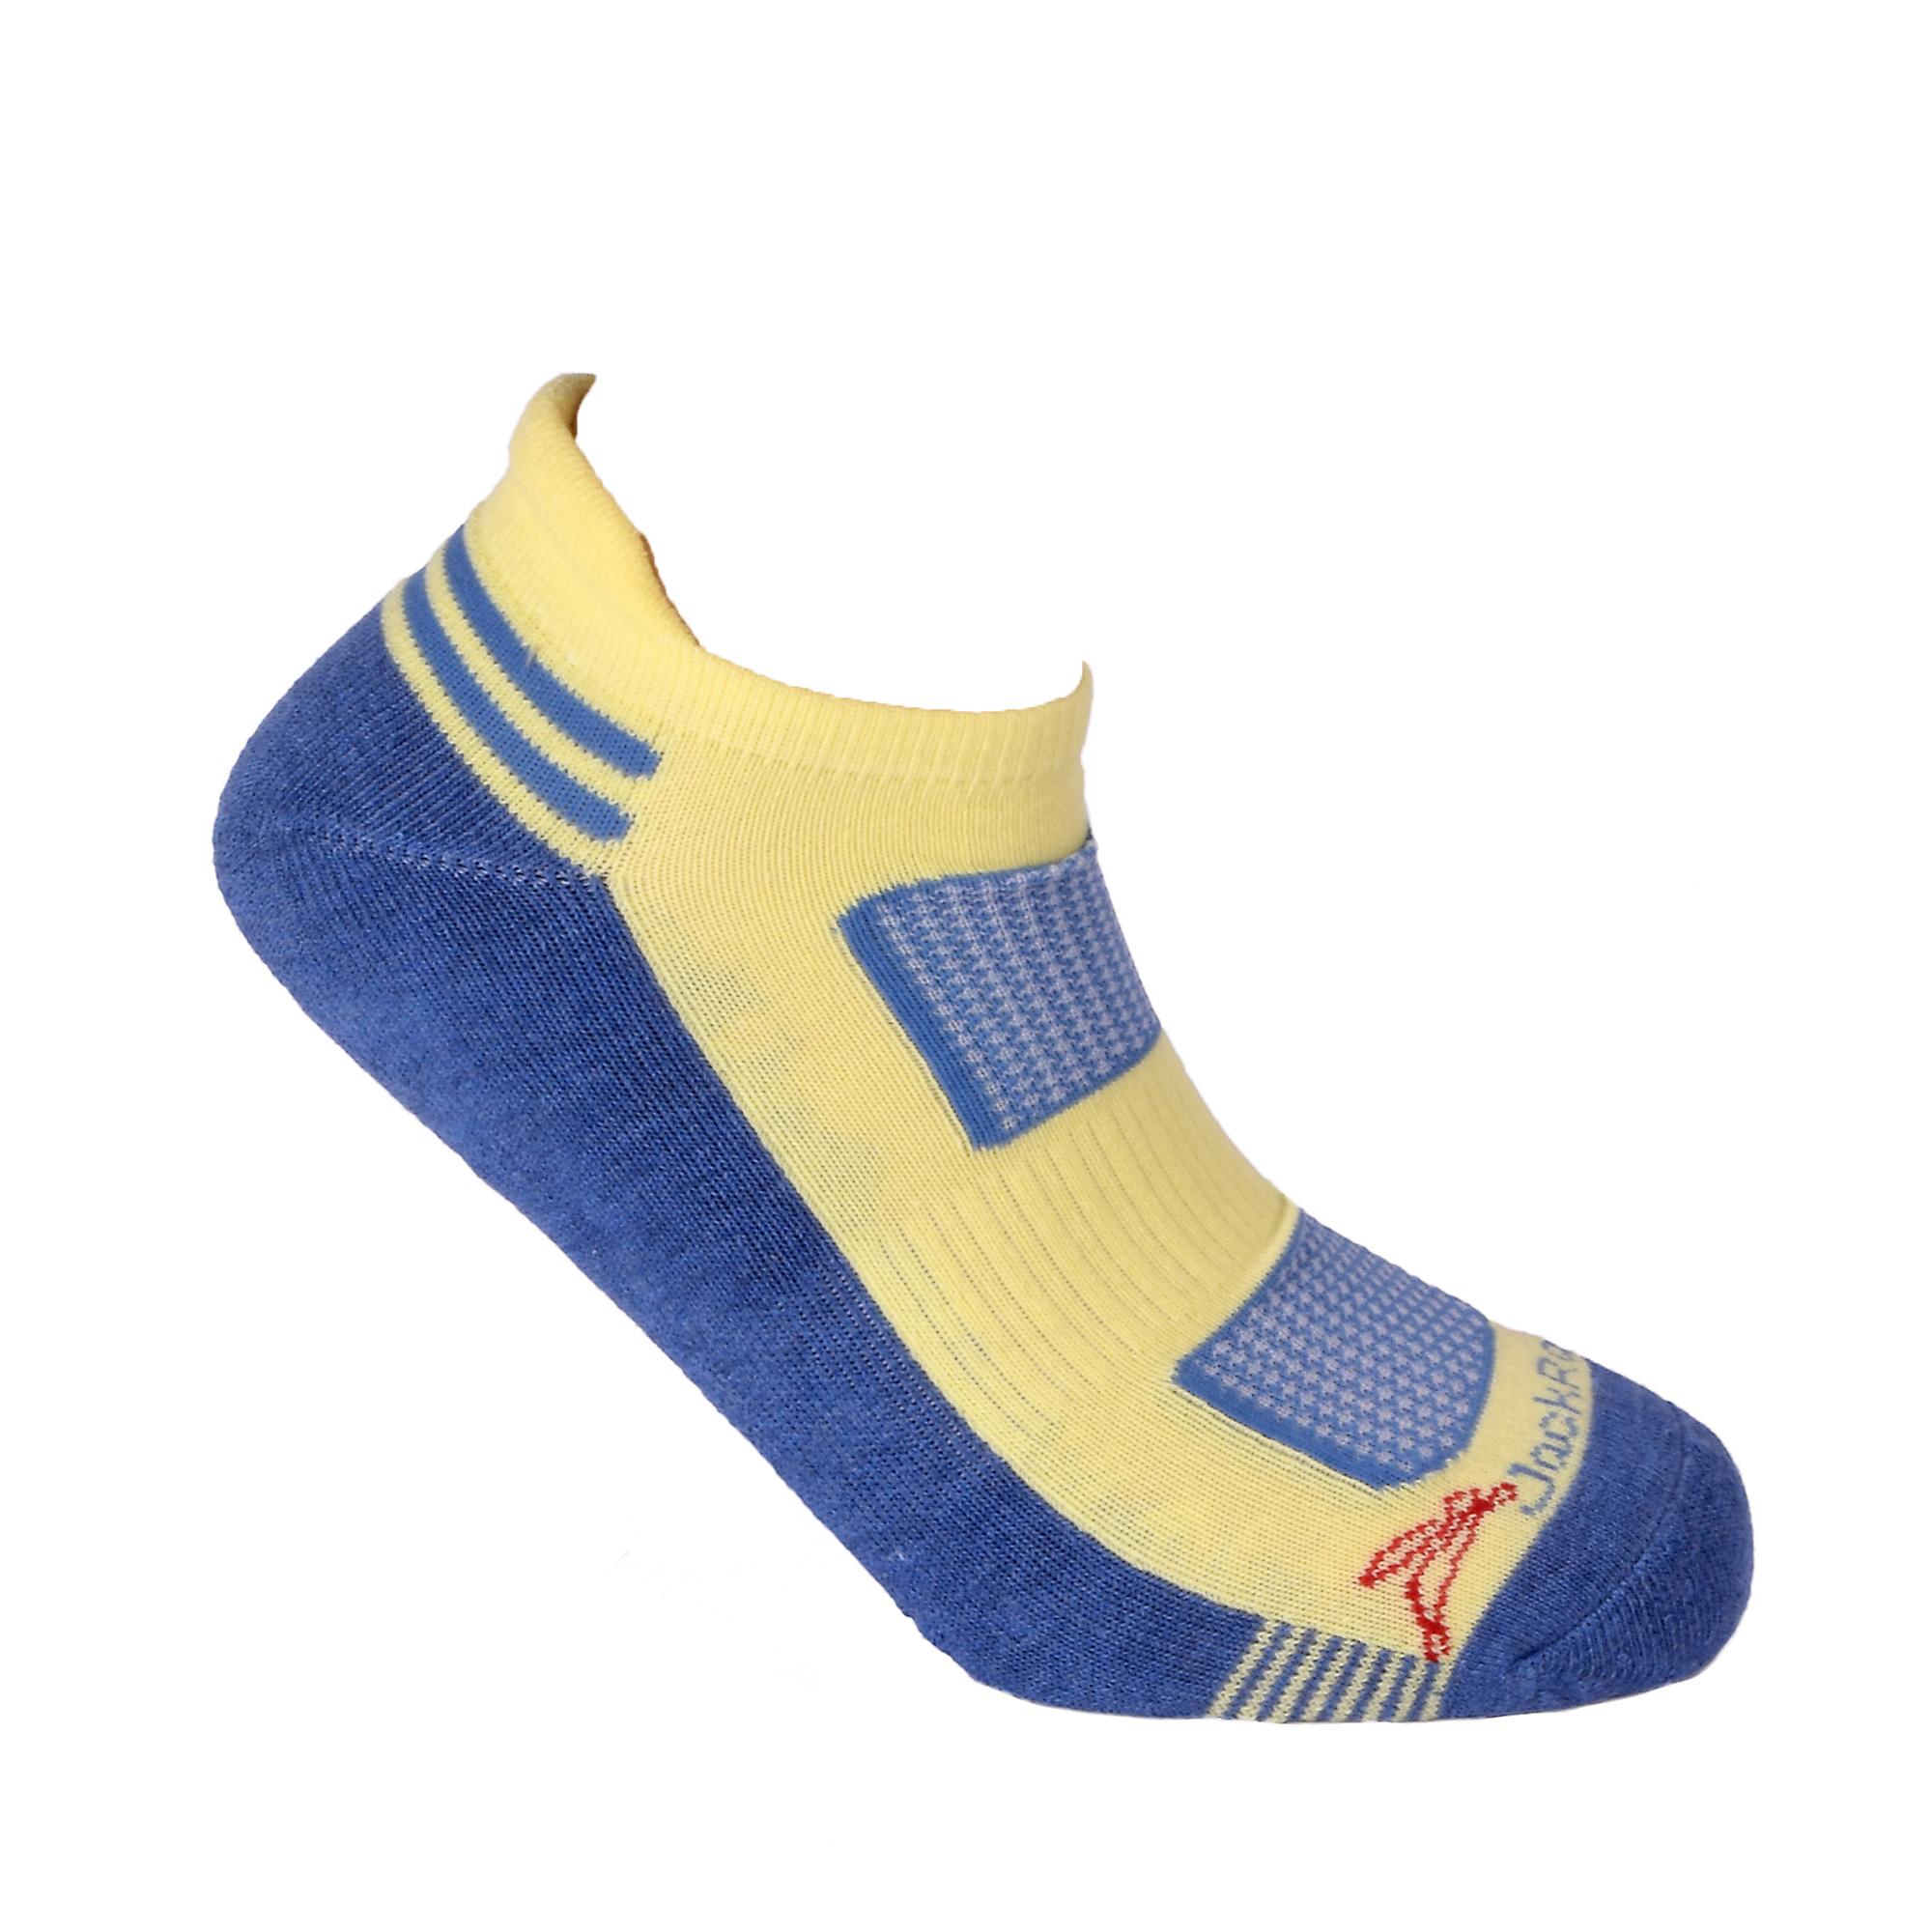 JackRabbit No Show Tab Cushion Socks 1 Pack - Color: Yellow/Navy - Size: S, Yellow/Navy, large, image 3